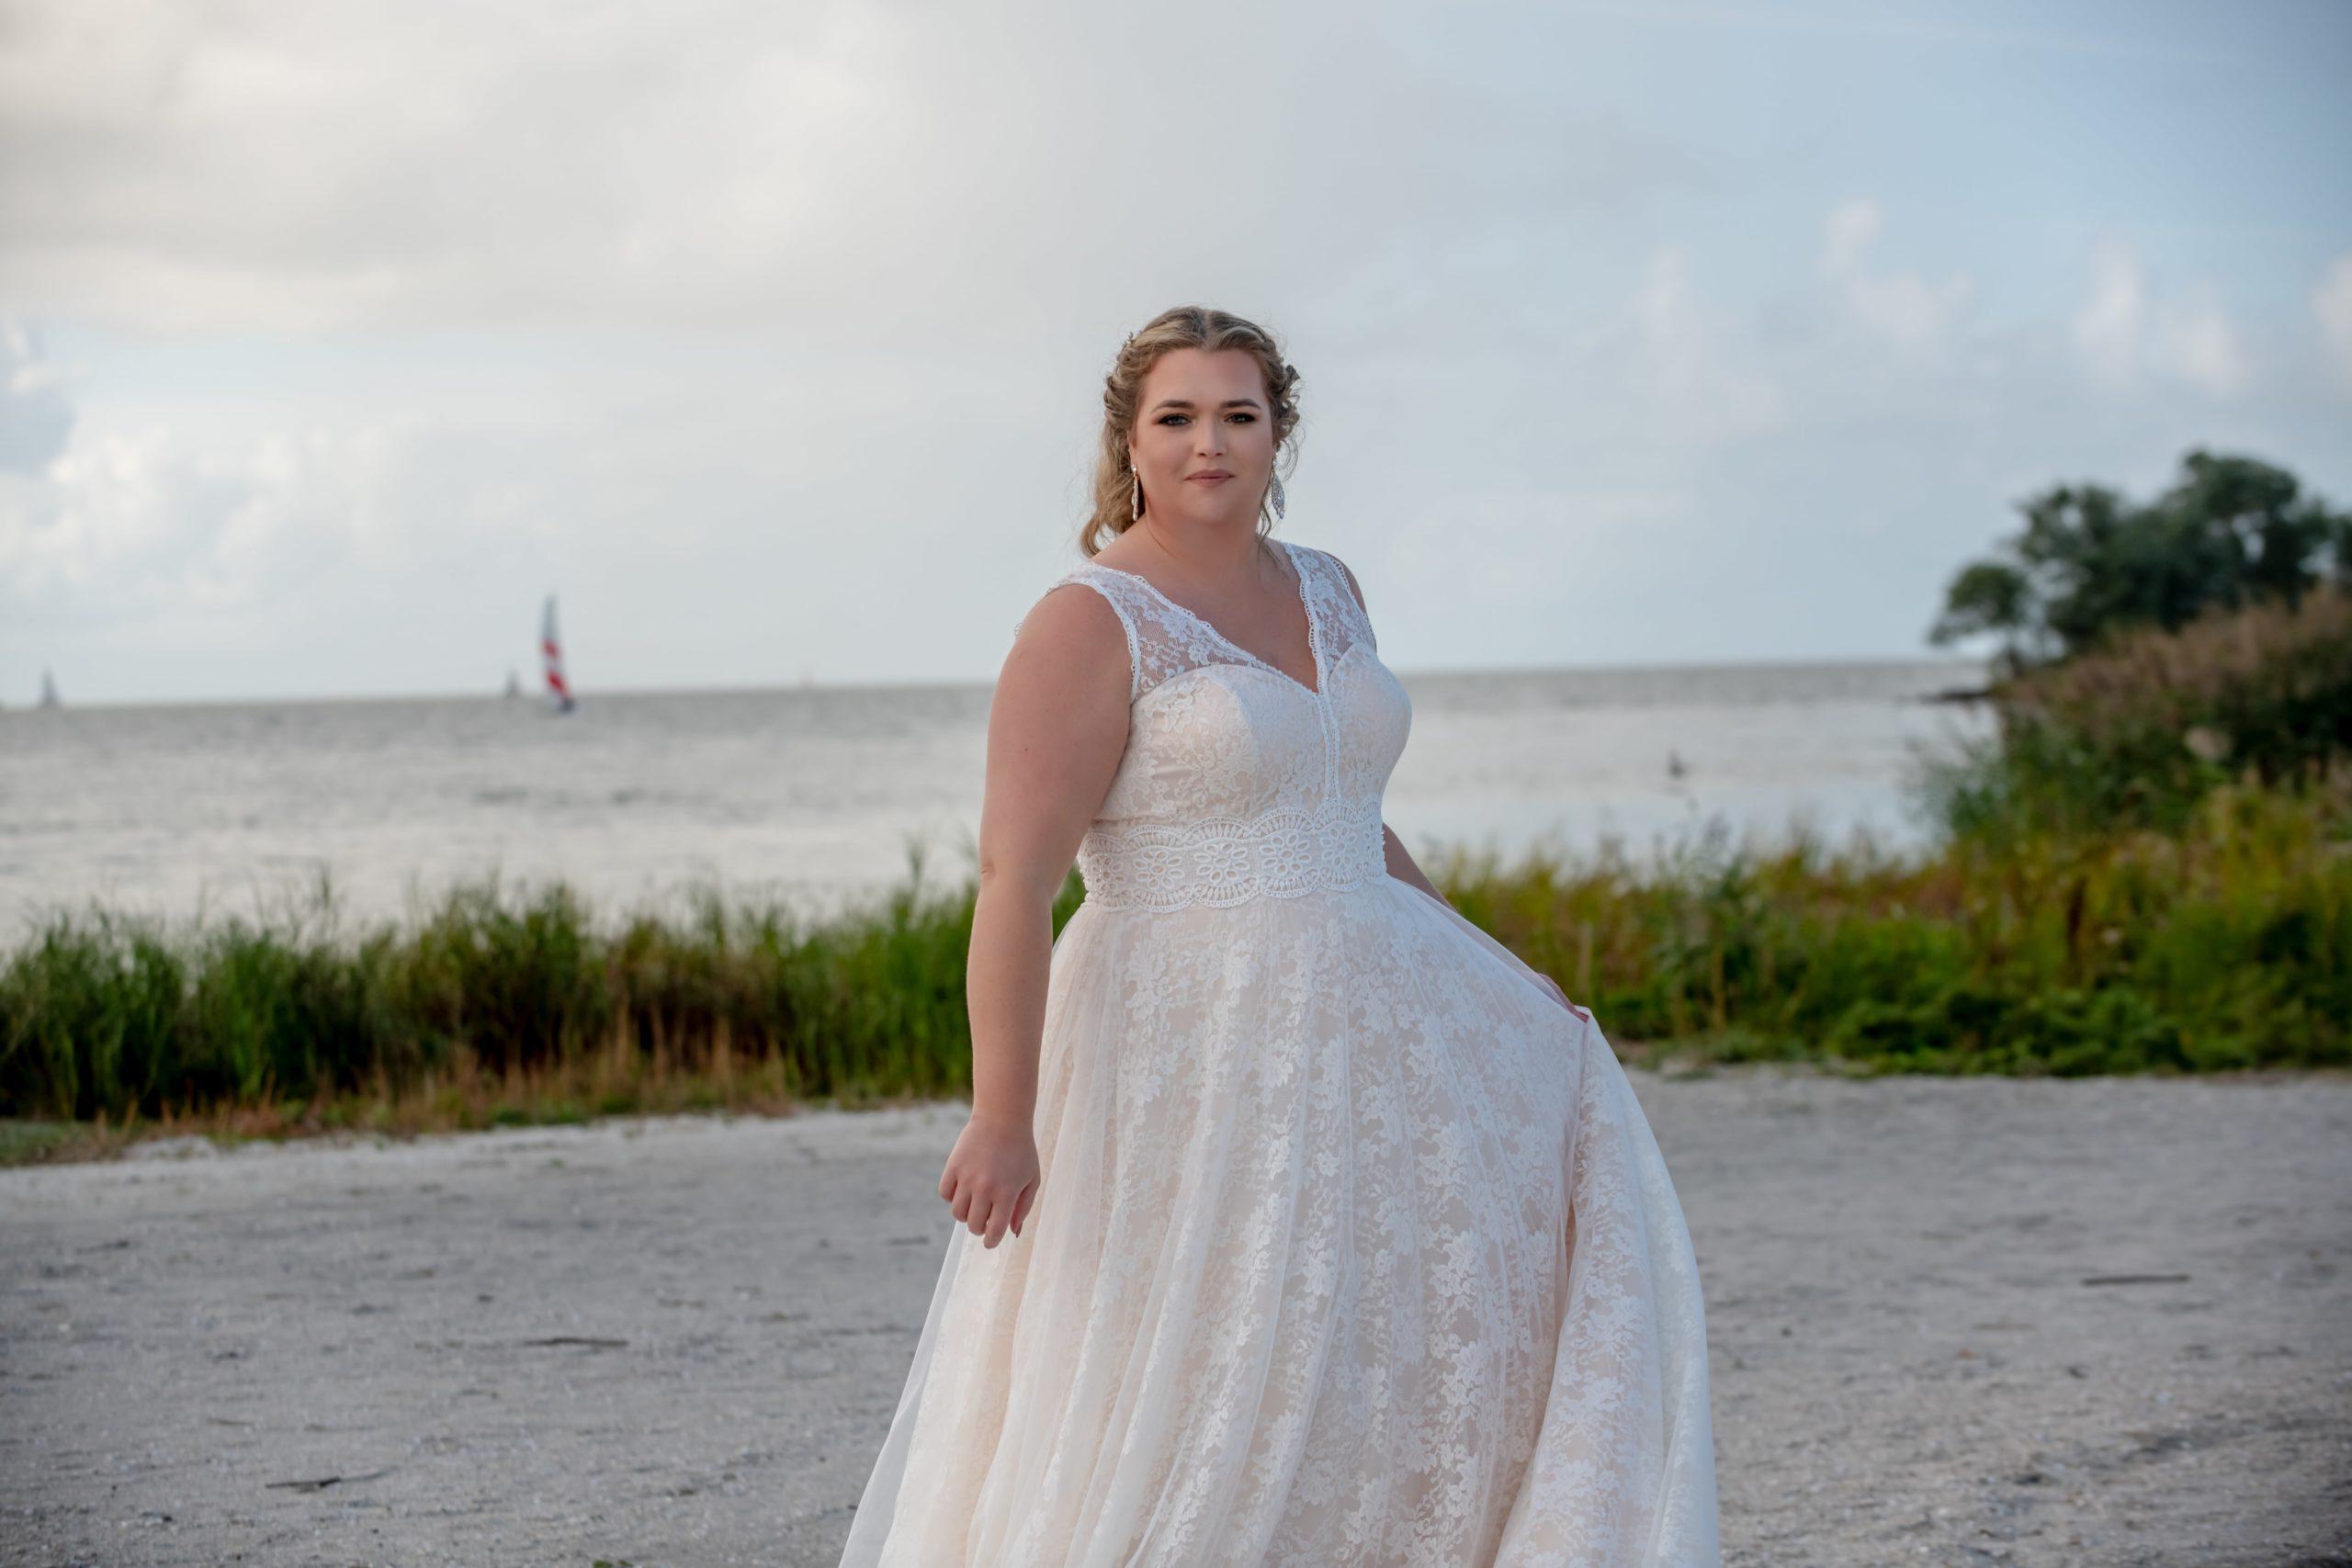 brautatelier ried-curvy bride collection-bridalstar-Gitte-boho-all over spitze-detail-1-min